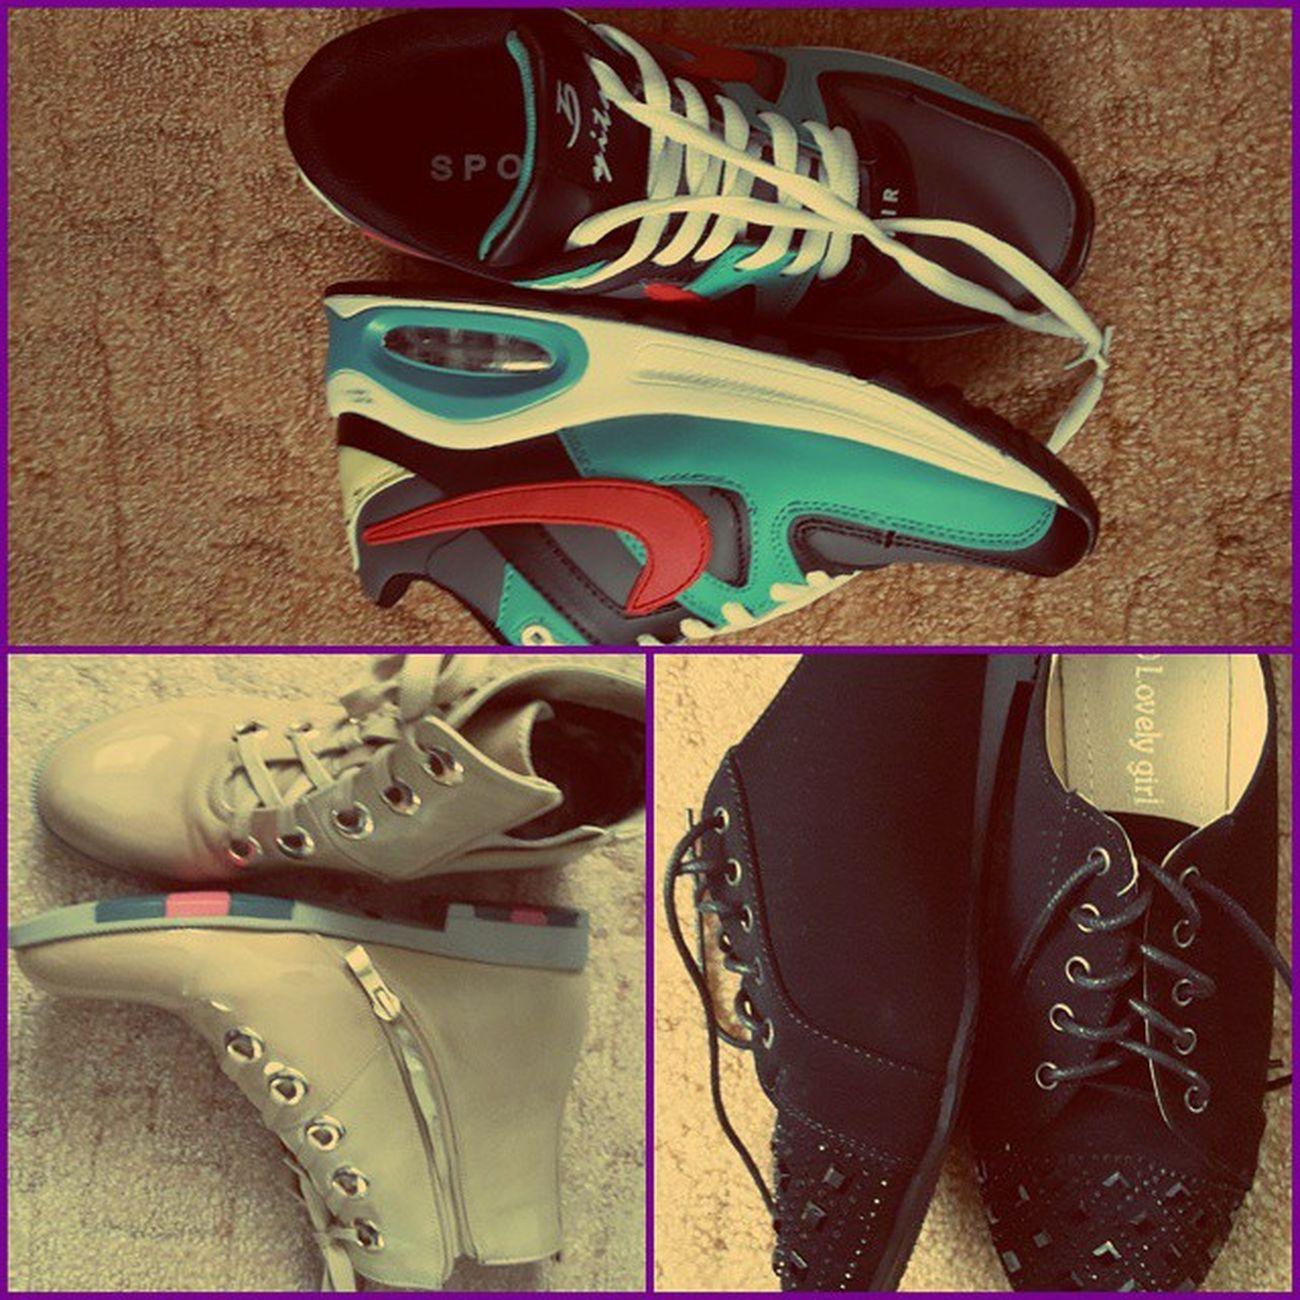 Обувь в школу))))* ненавижушколу люблюшопиться ?